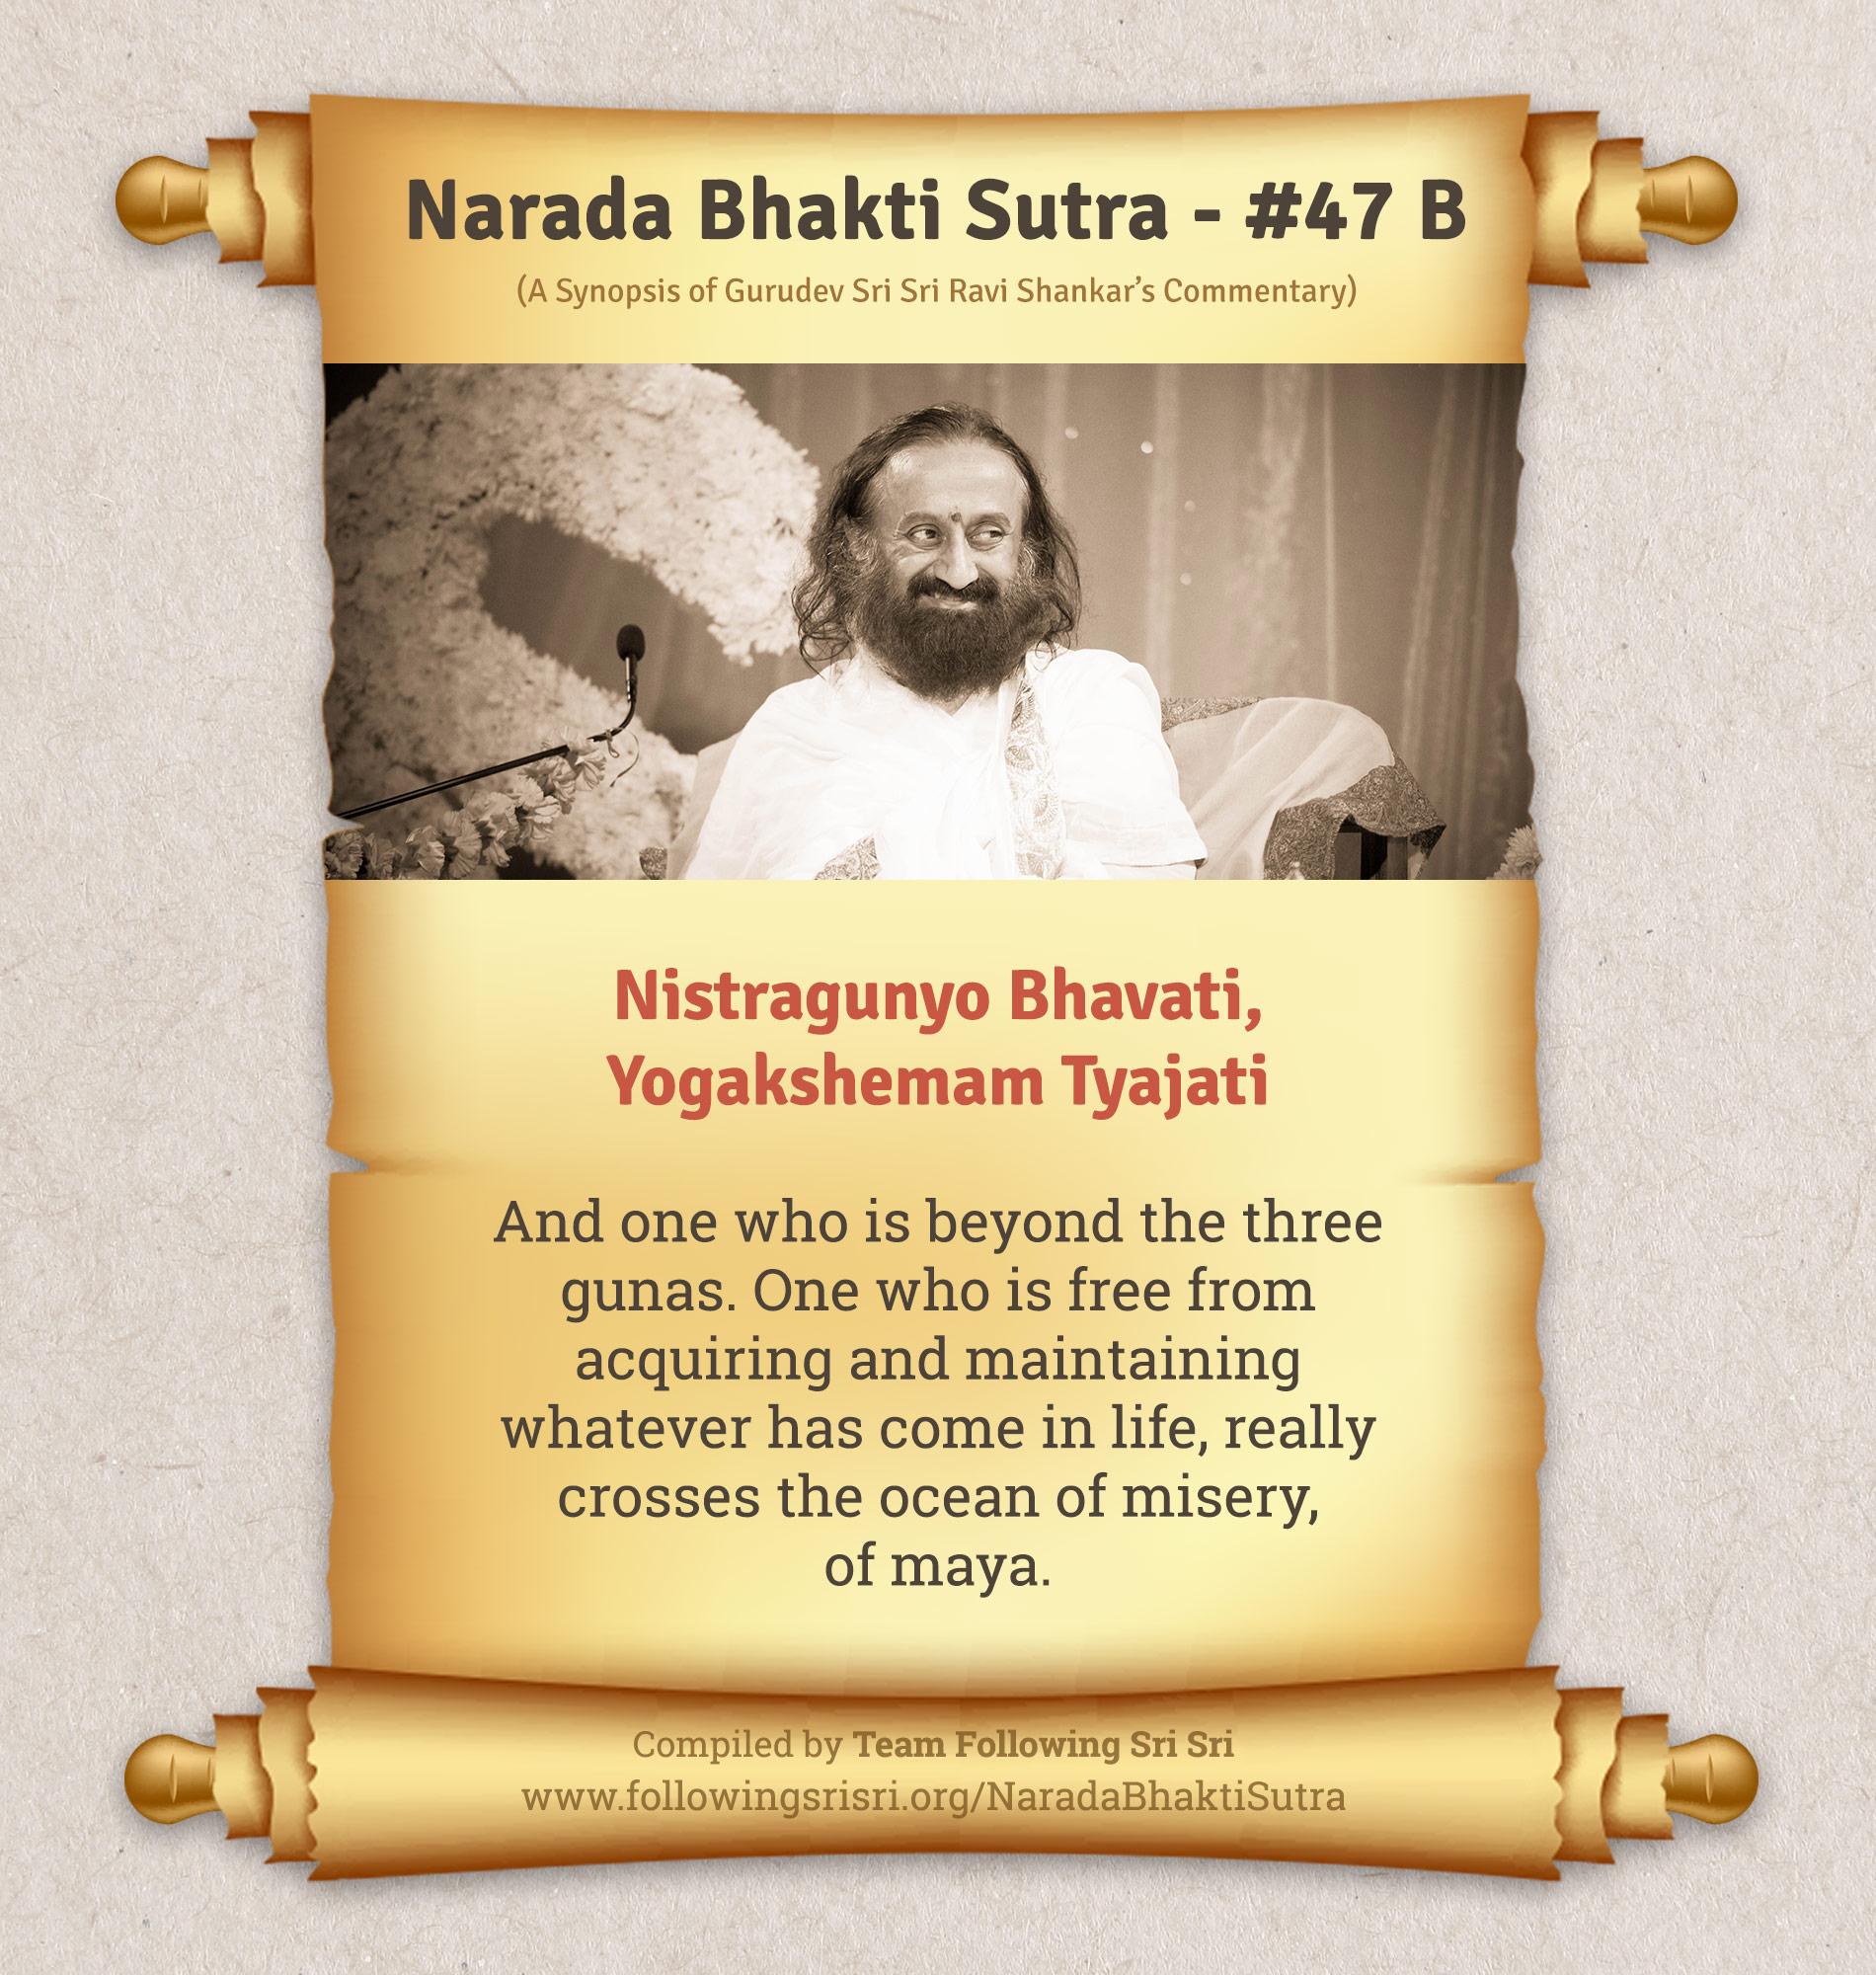 Narada Bhakti Sutras - Sutra 47 B